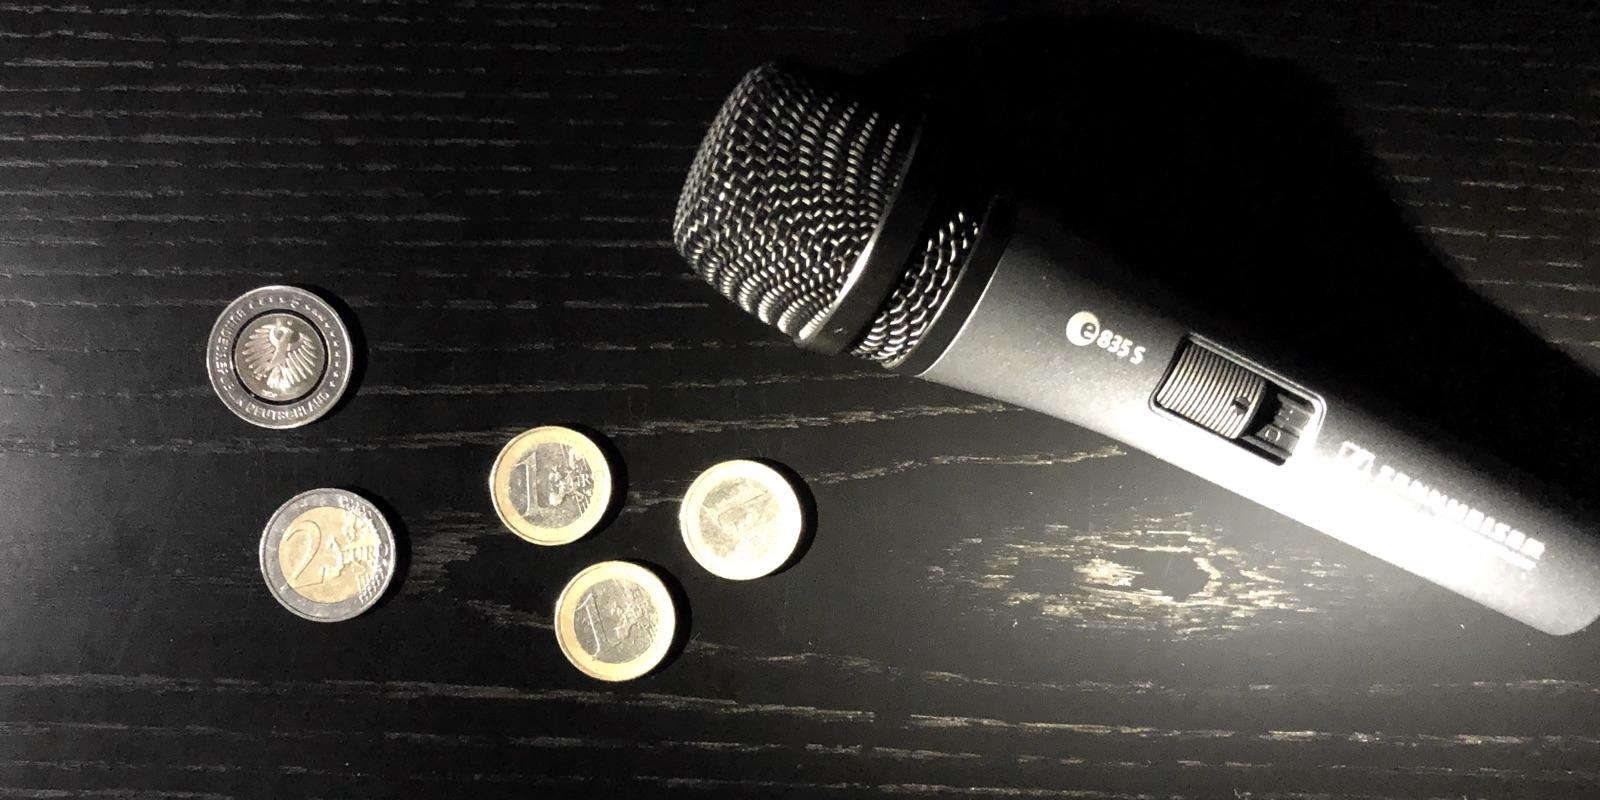 10 € in bar neben einem Mikrofon